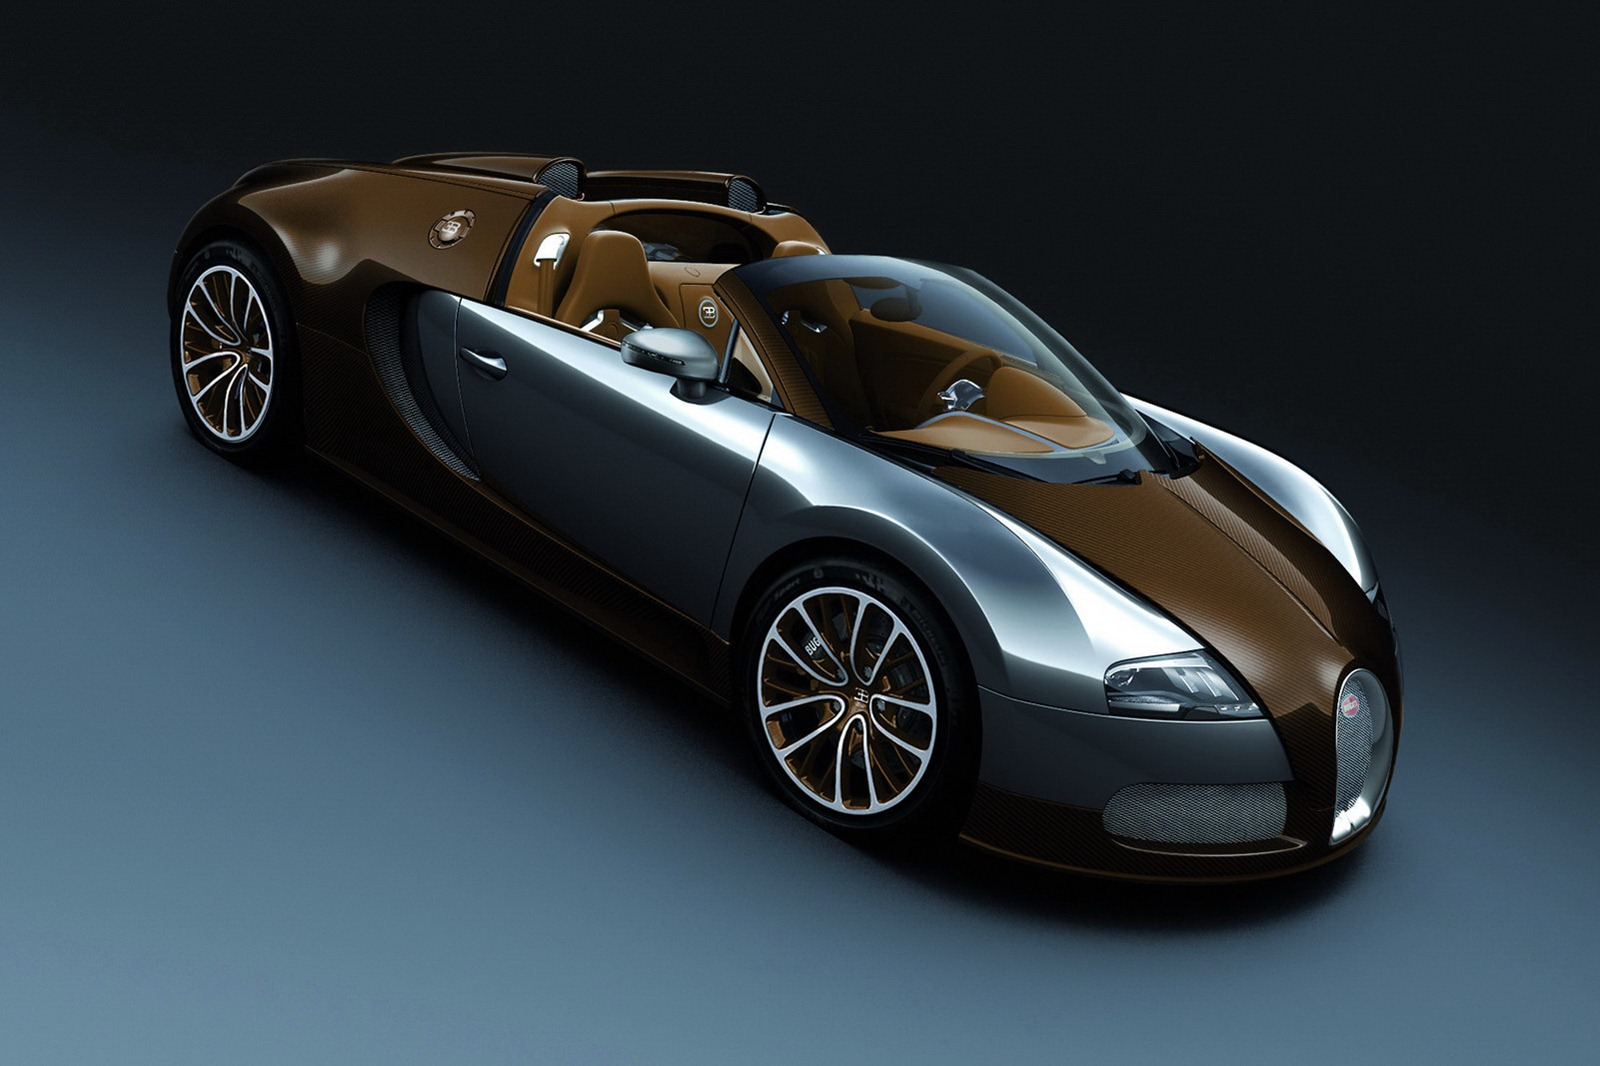 bugatti veyron 16 4 grand sport vitesse video. Black Bedroom Furniture Sets. Home Design Ideas